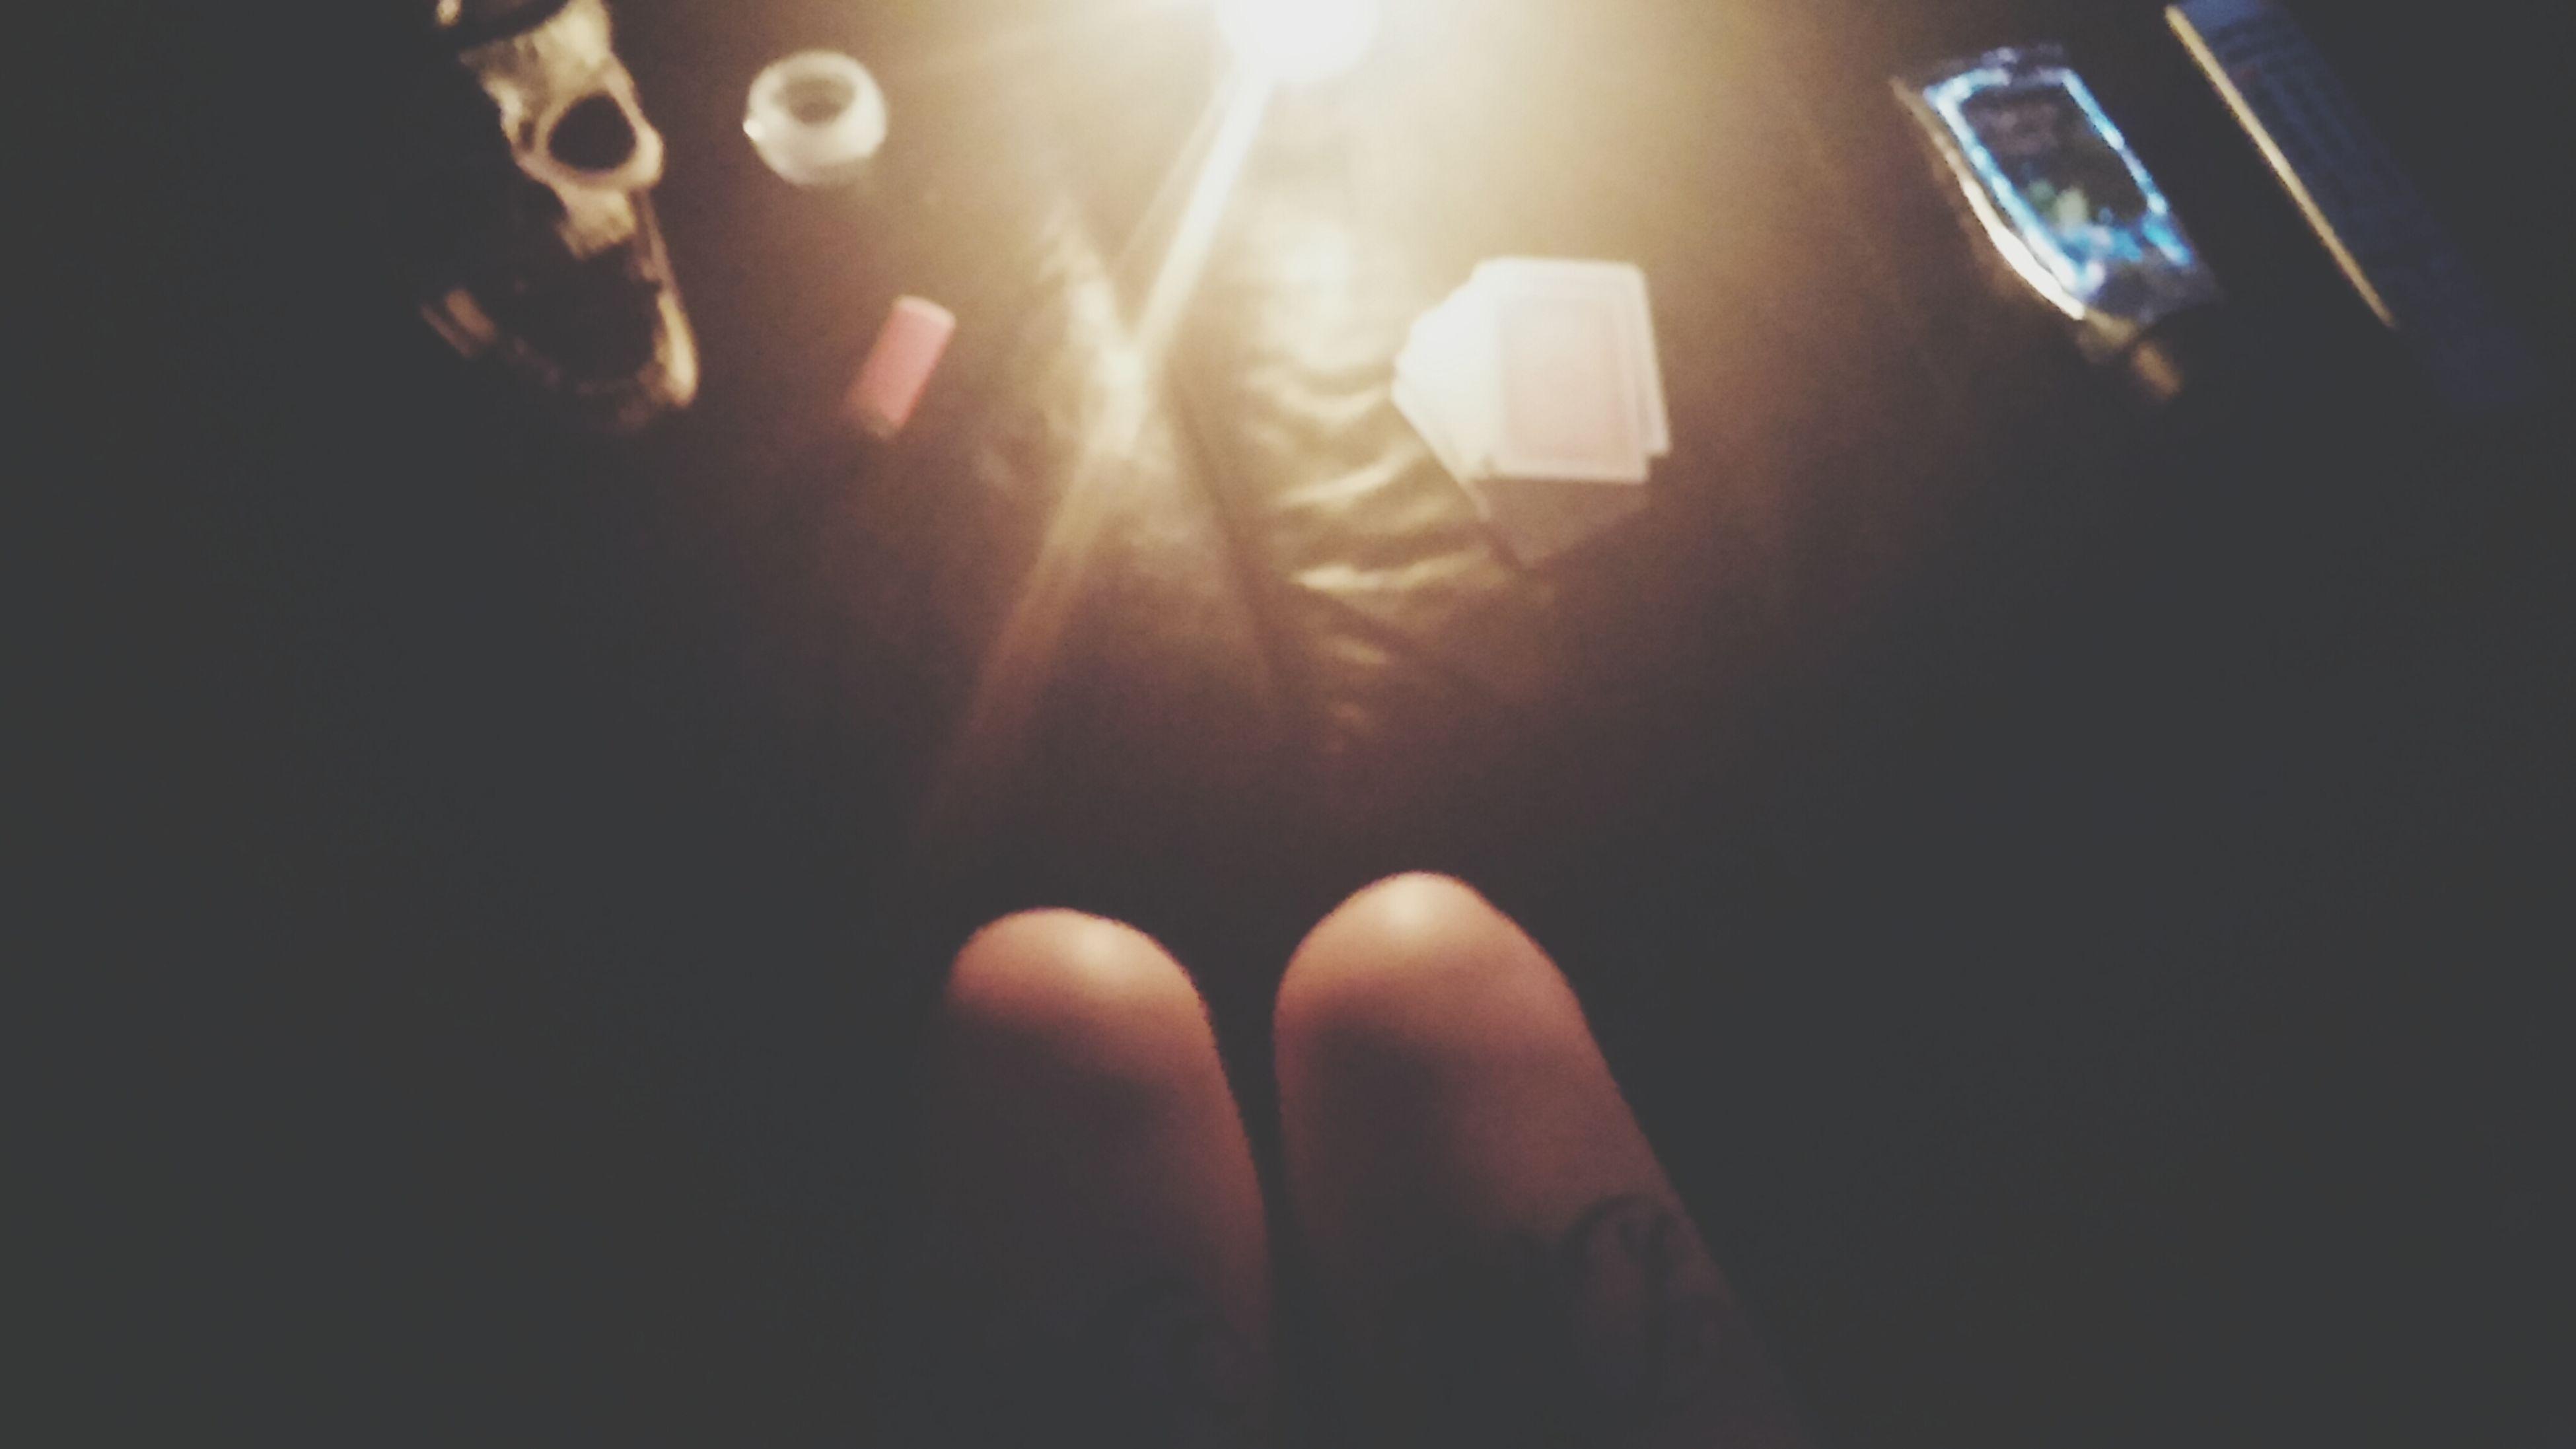 indoors, lifestyles, illuminated, leisure activity, night, lens flare, men, unrecognizable person, person, personal perspective, light - natural phenomenon, dark, sunlight, part of, sunbeam, glowing